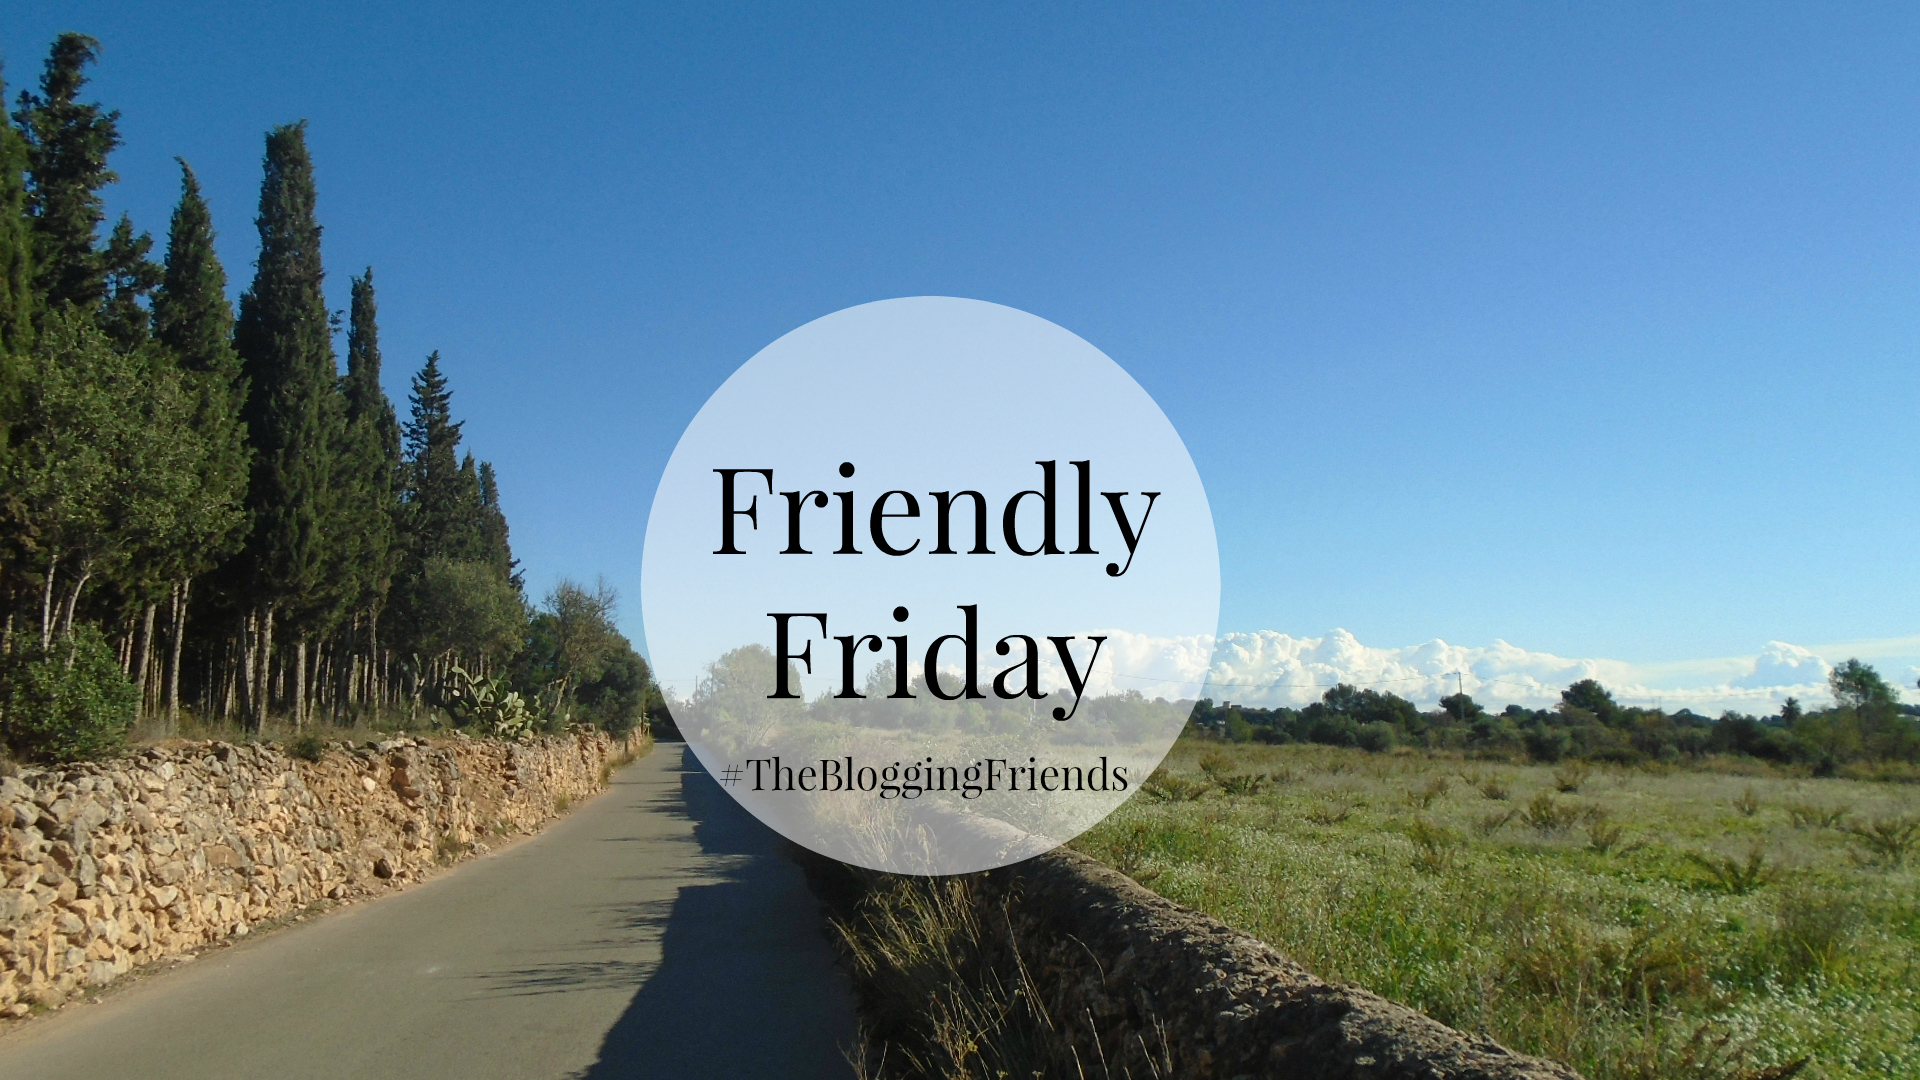 FriendlyFri.jpg